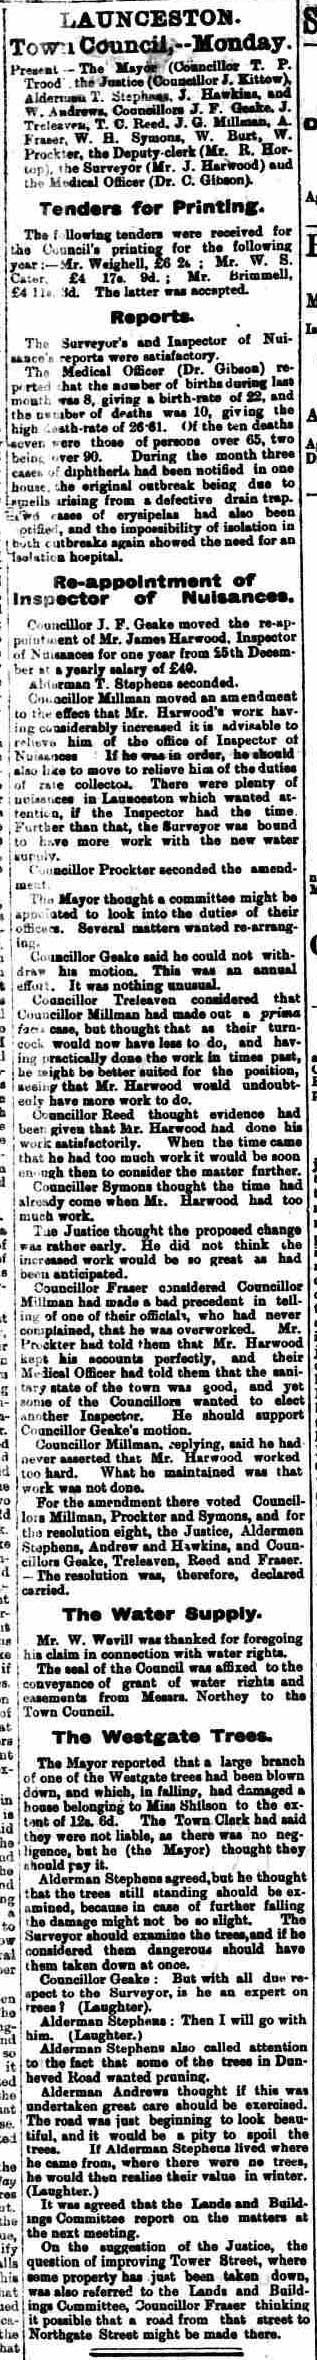 14 December 1895